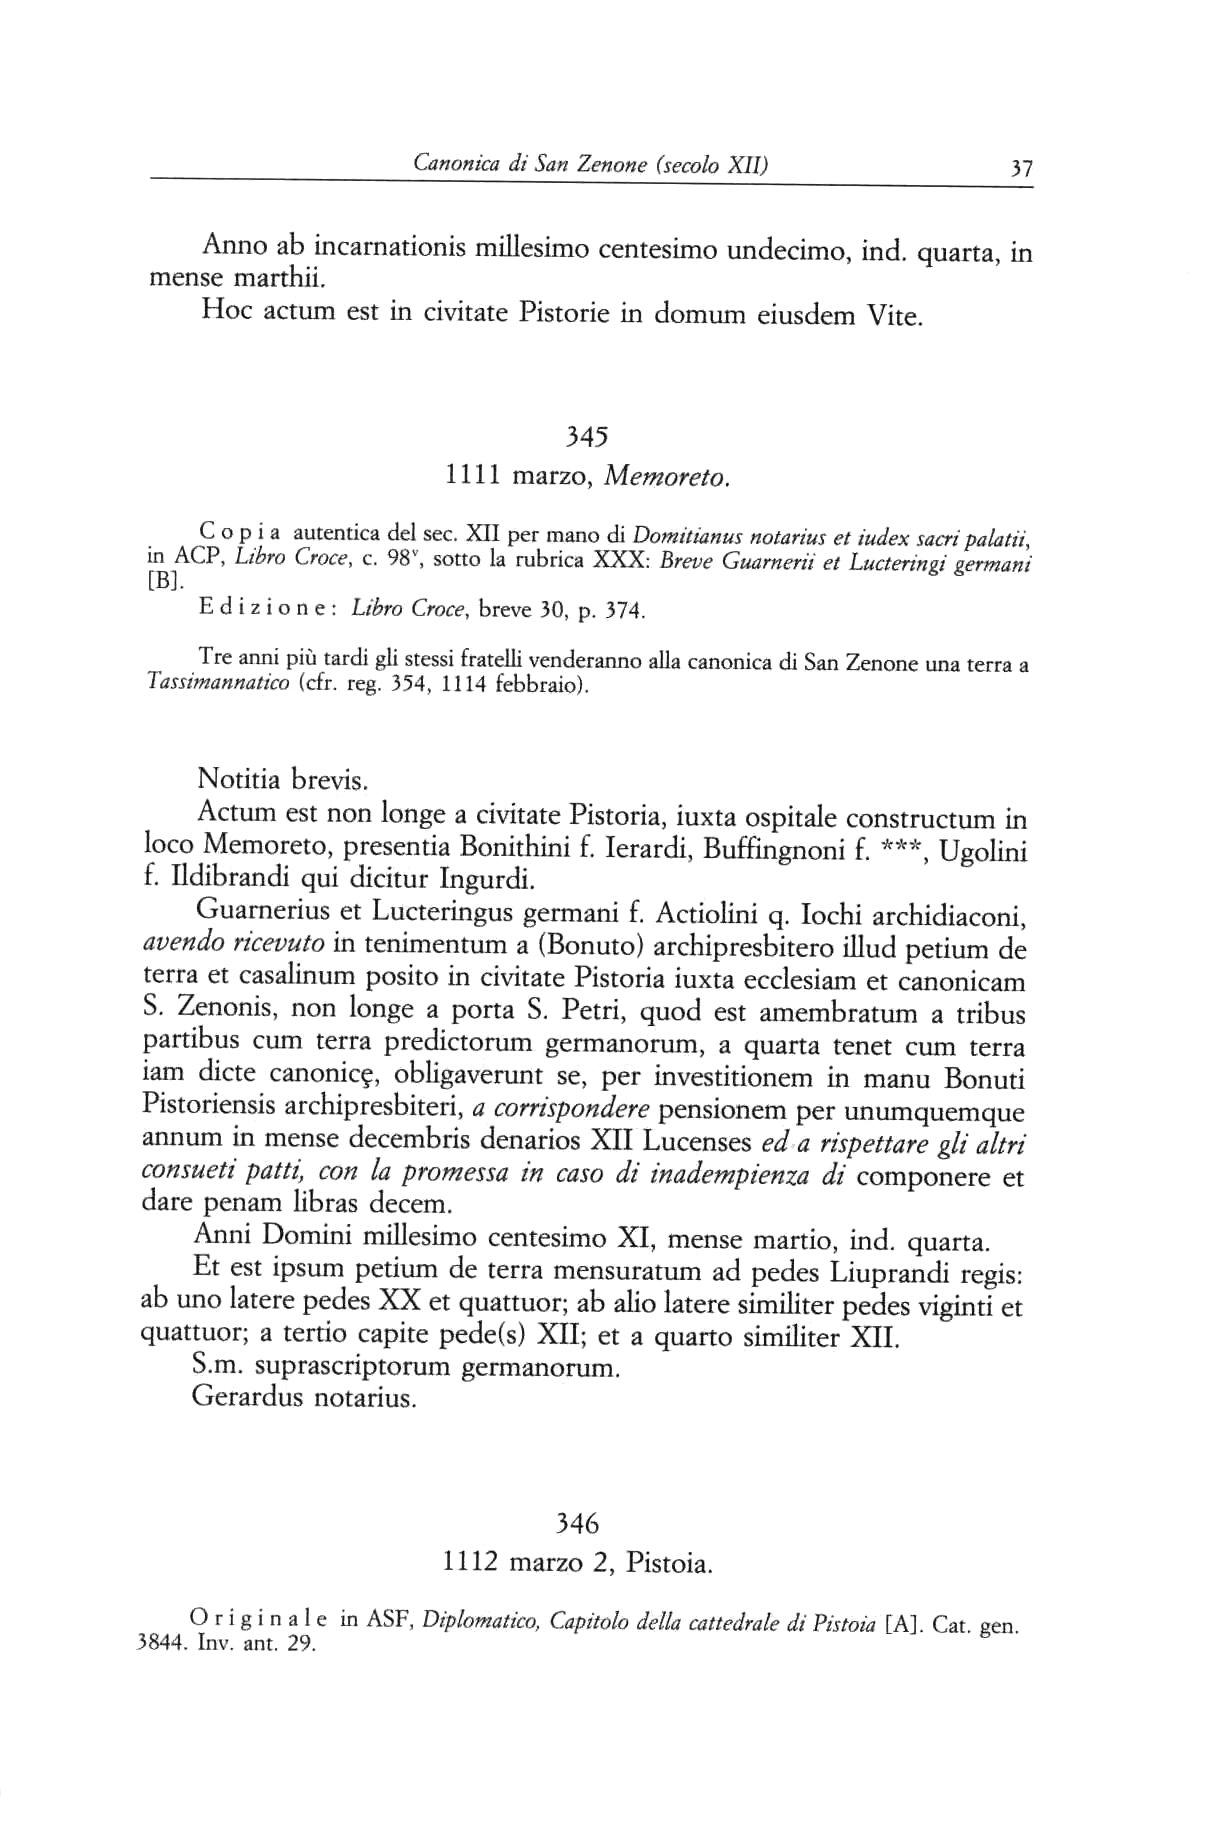 Canonica S. Zenone XII 0037.jpg